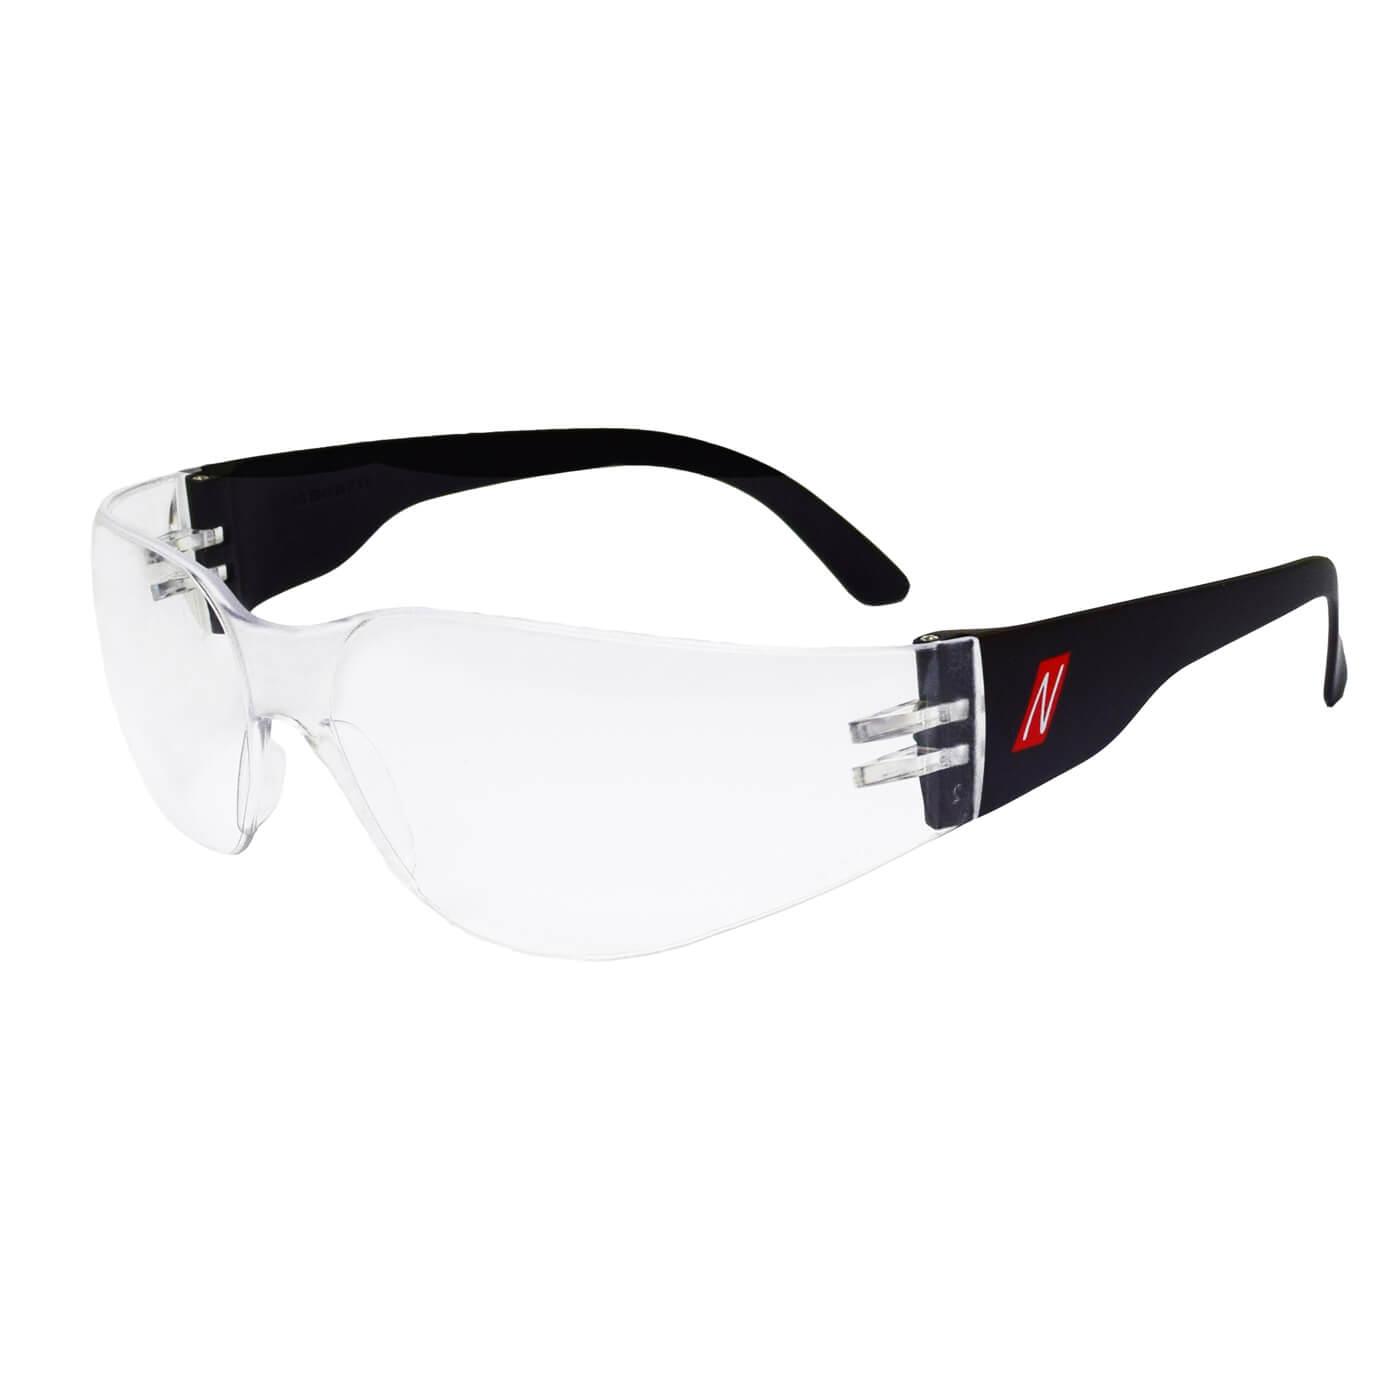 Okulary ochronne Nitras Vision Protect Basic 9000